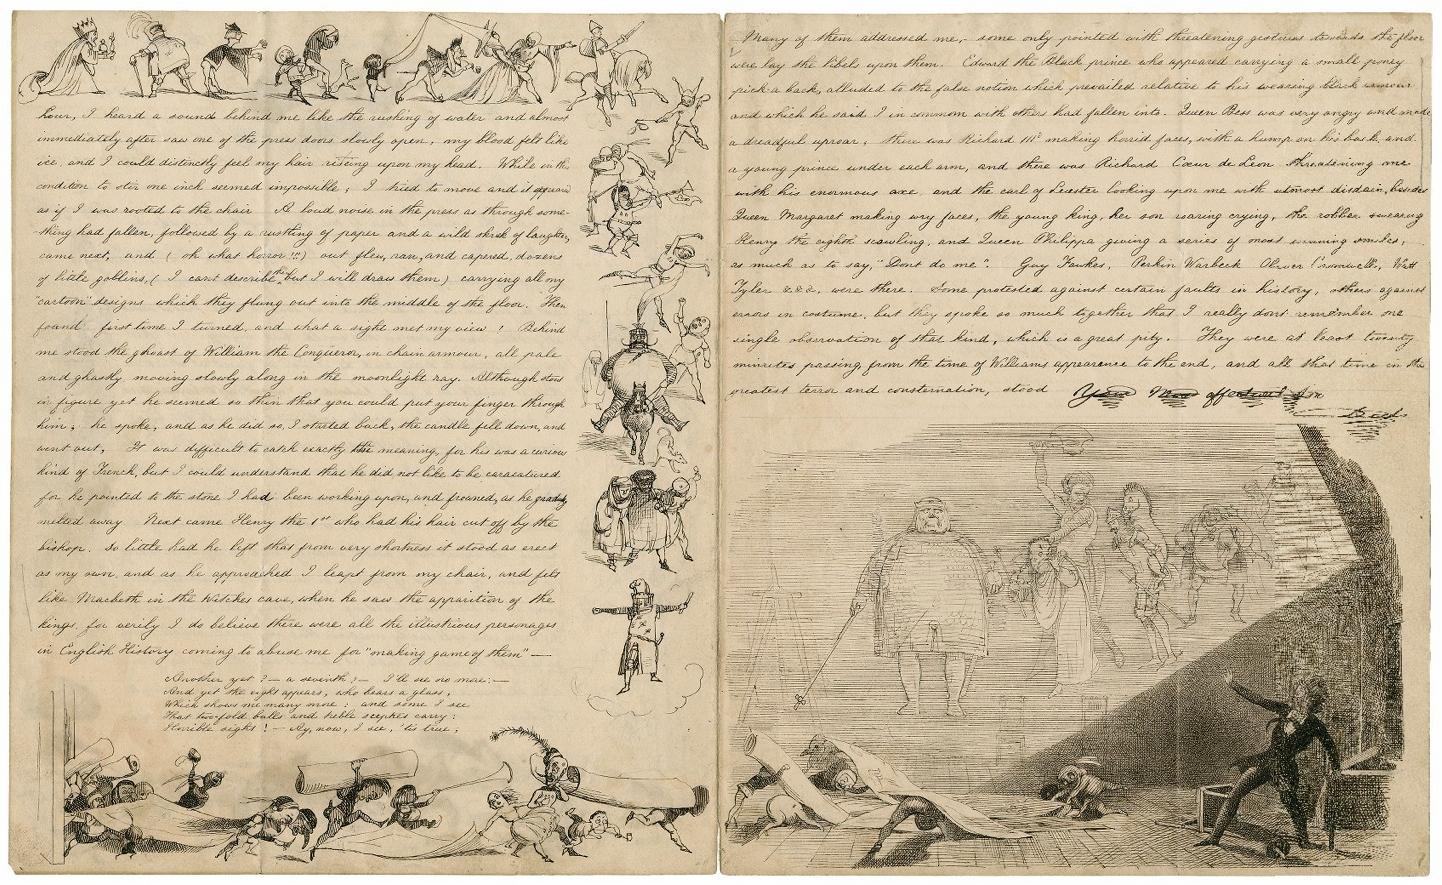 RichardDoyle, 1824-1883, letter.